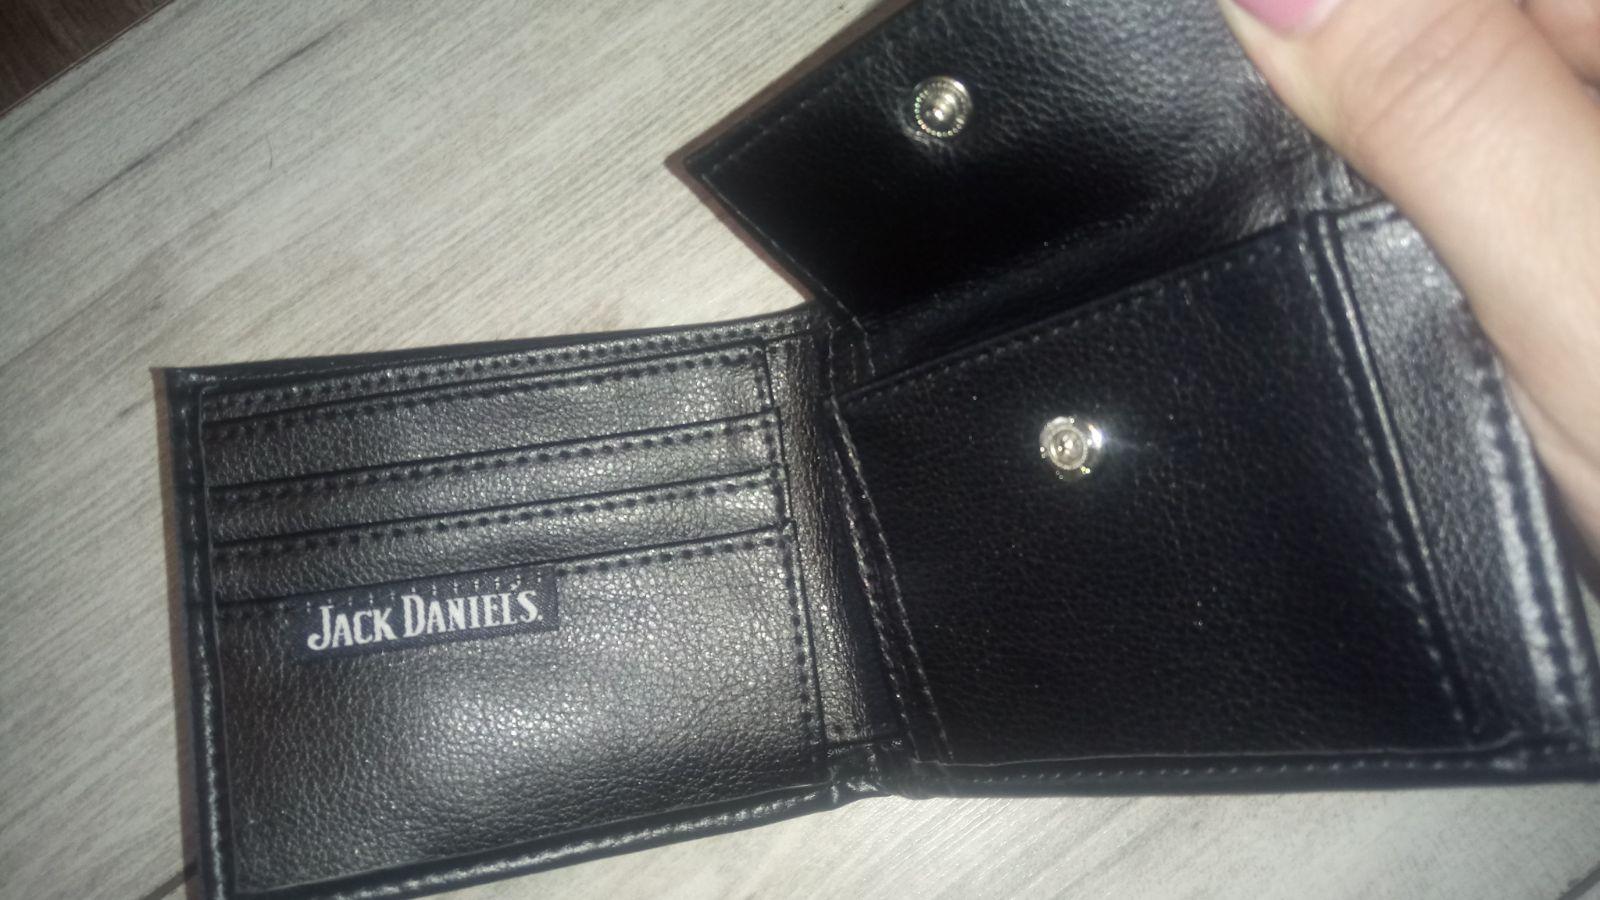 e62d7e2ba5532 Portfel Męski Jack Daniels Czarny na Prezent - 7093531036 ...